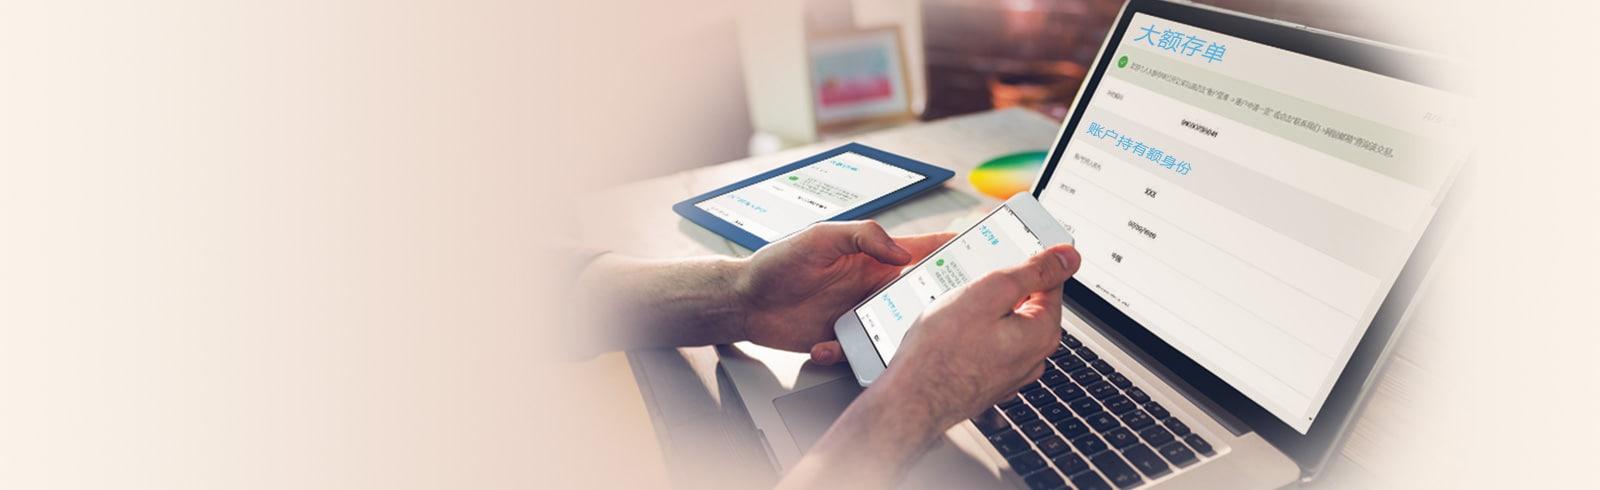 Cn online banking online cd